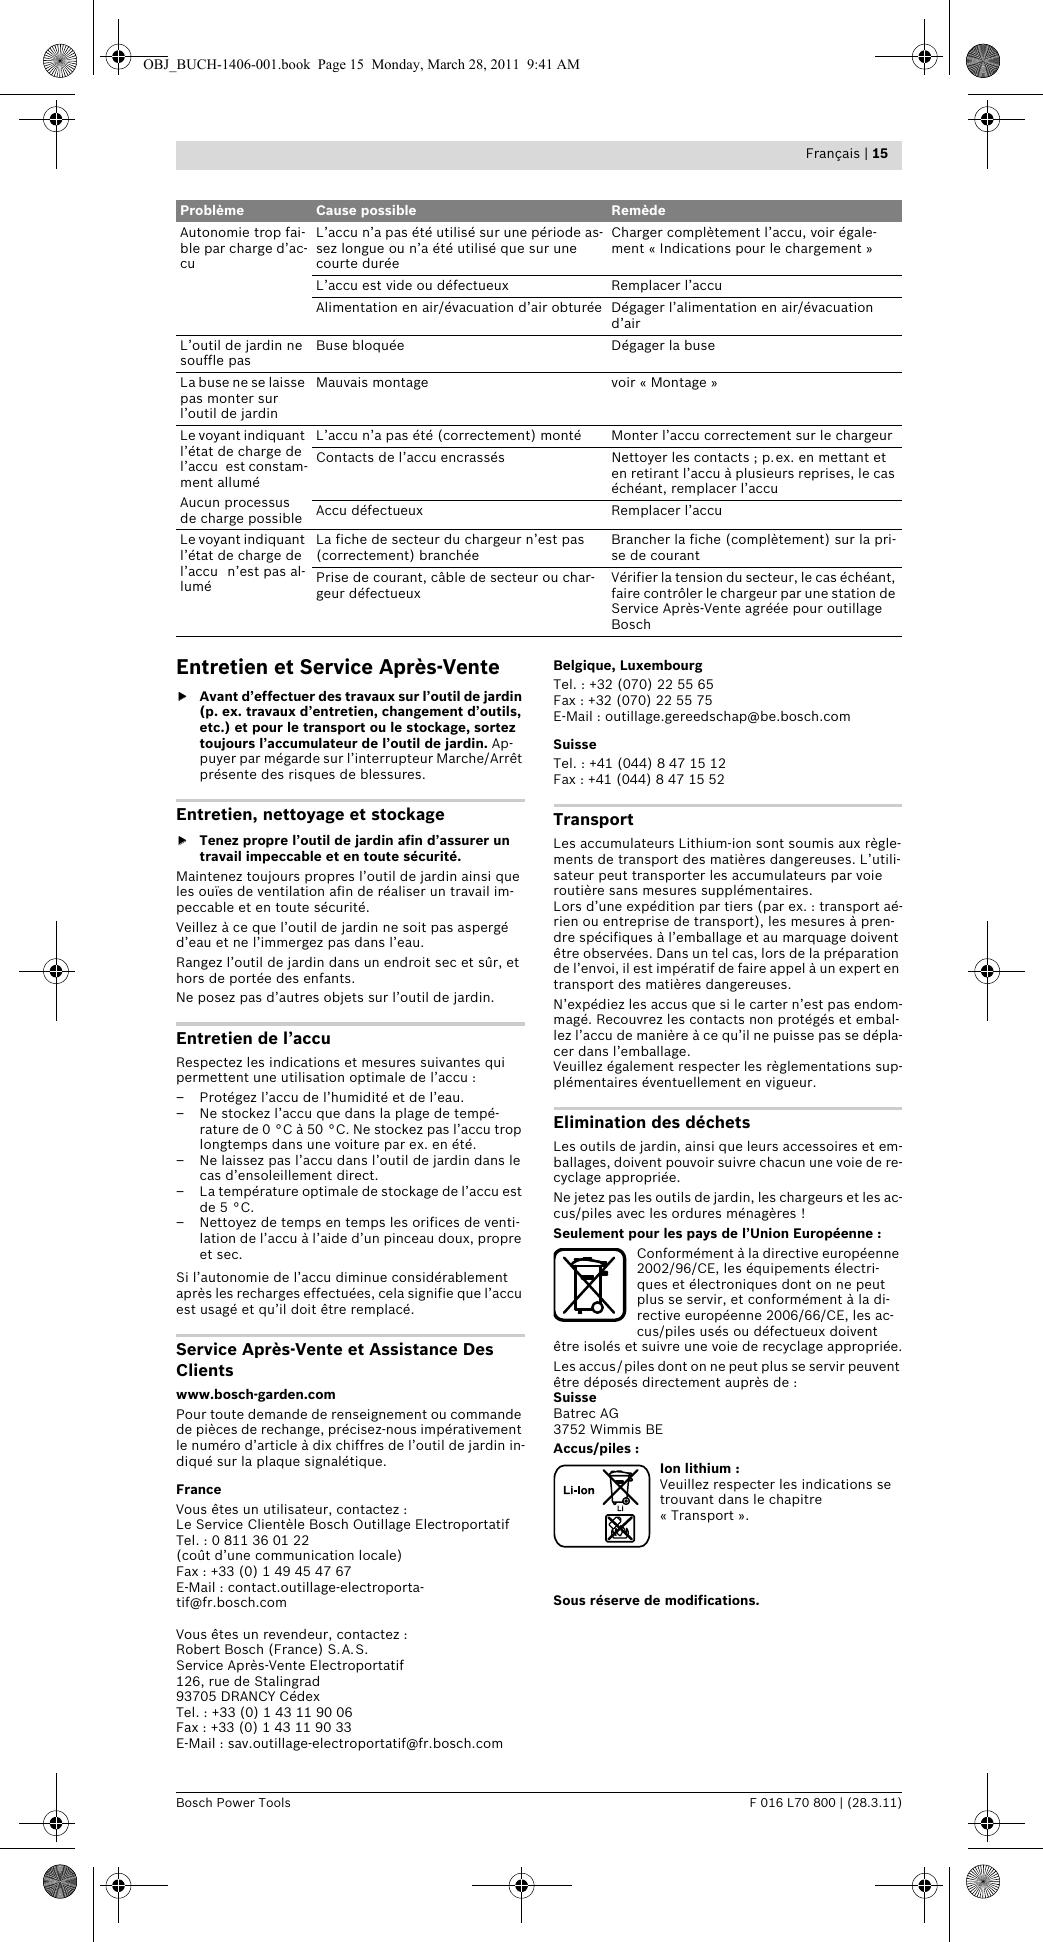 BoschAlb18Li User Guide Page 16